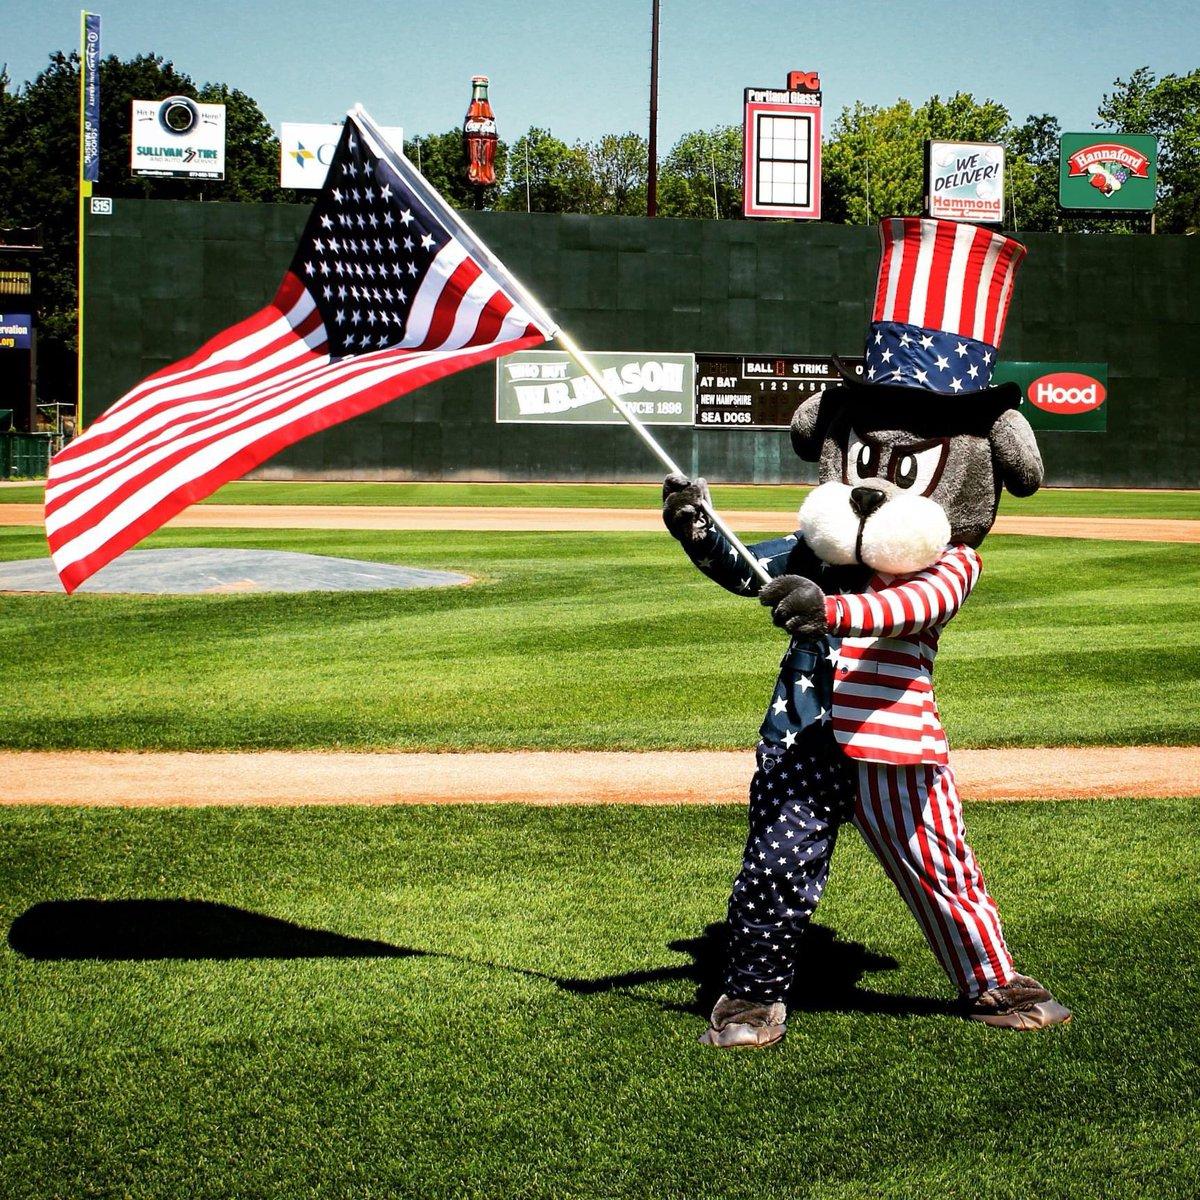 Happy Birthday, America! 🇺🇸🎇 #MiLBFunOnThe4th